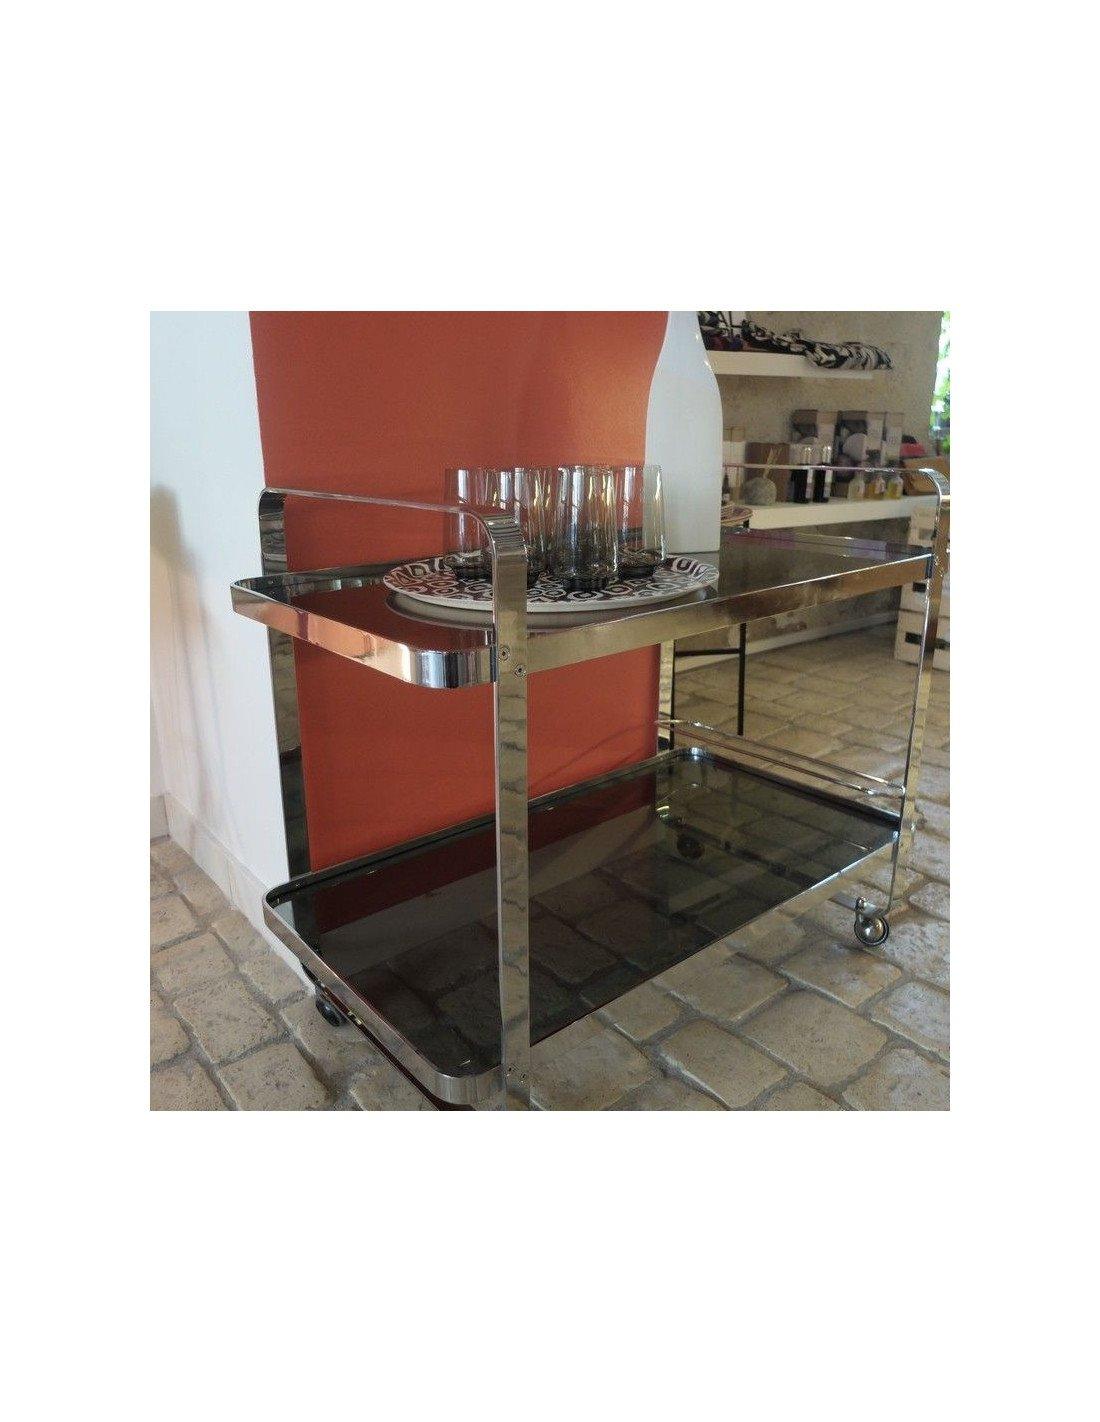 brocante vintage table roulante inox et verre fum gris. Black Bedroom Furniture Sets. Home Design Ideas